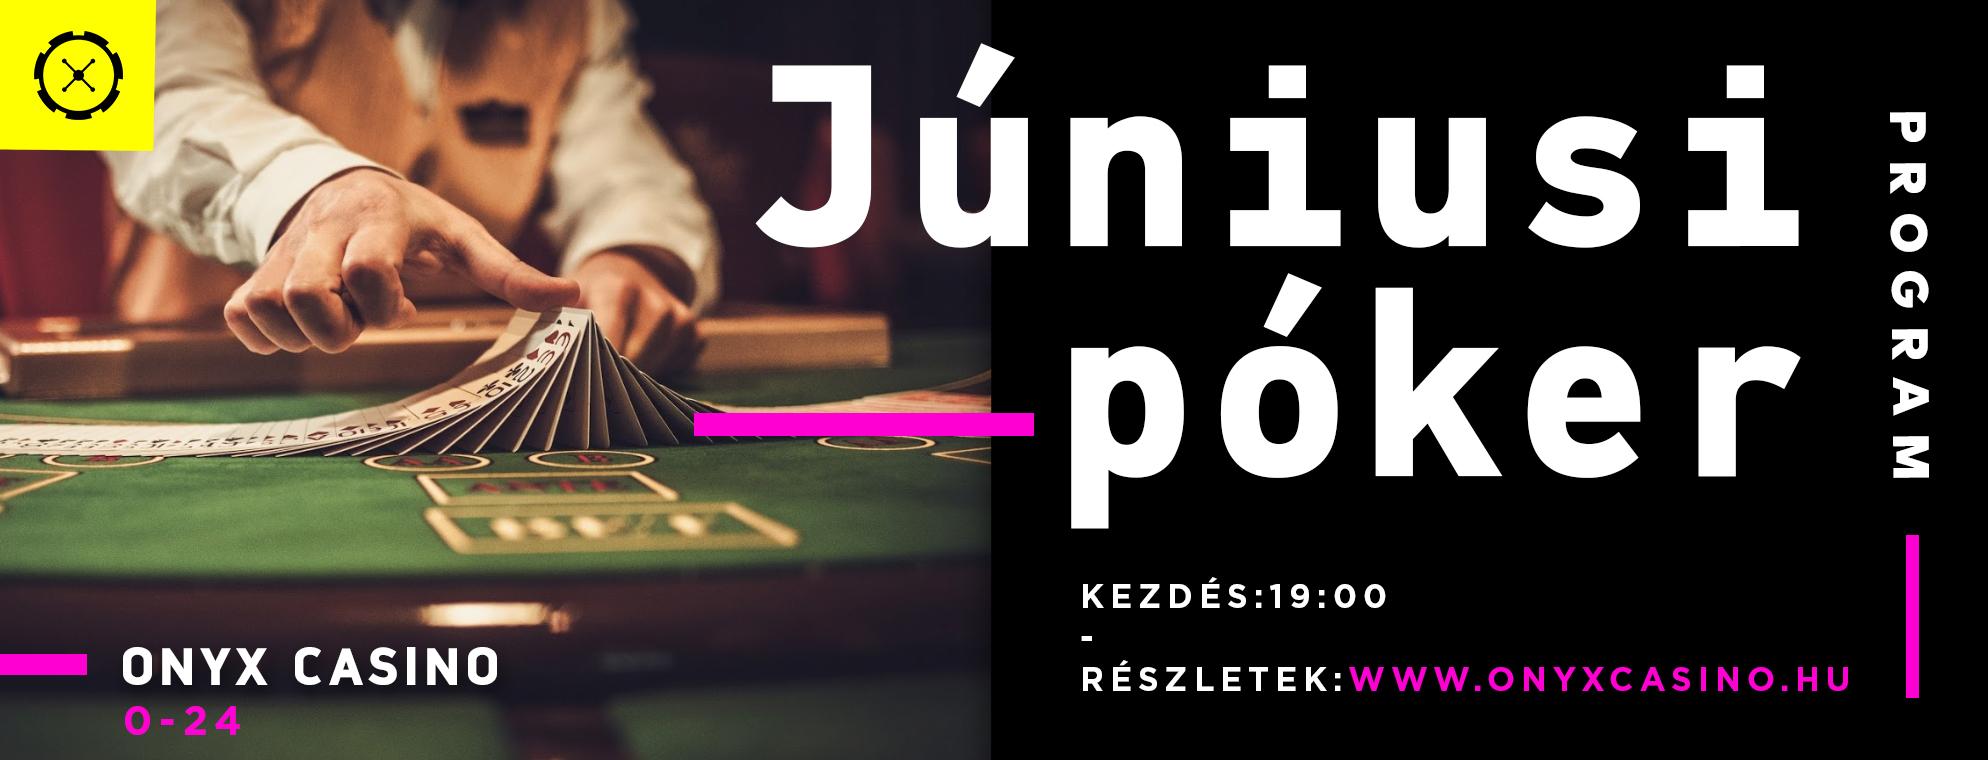 onyxcasino_juniusi_poker_webslide_alap_2018_05_28_02